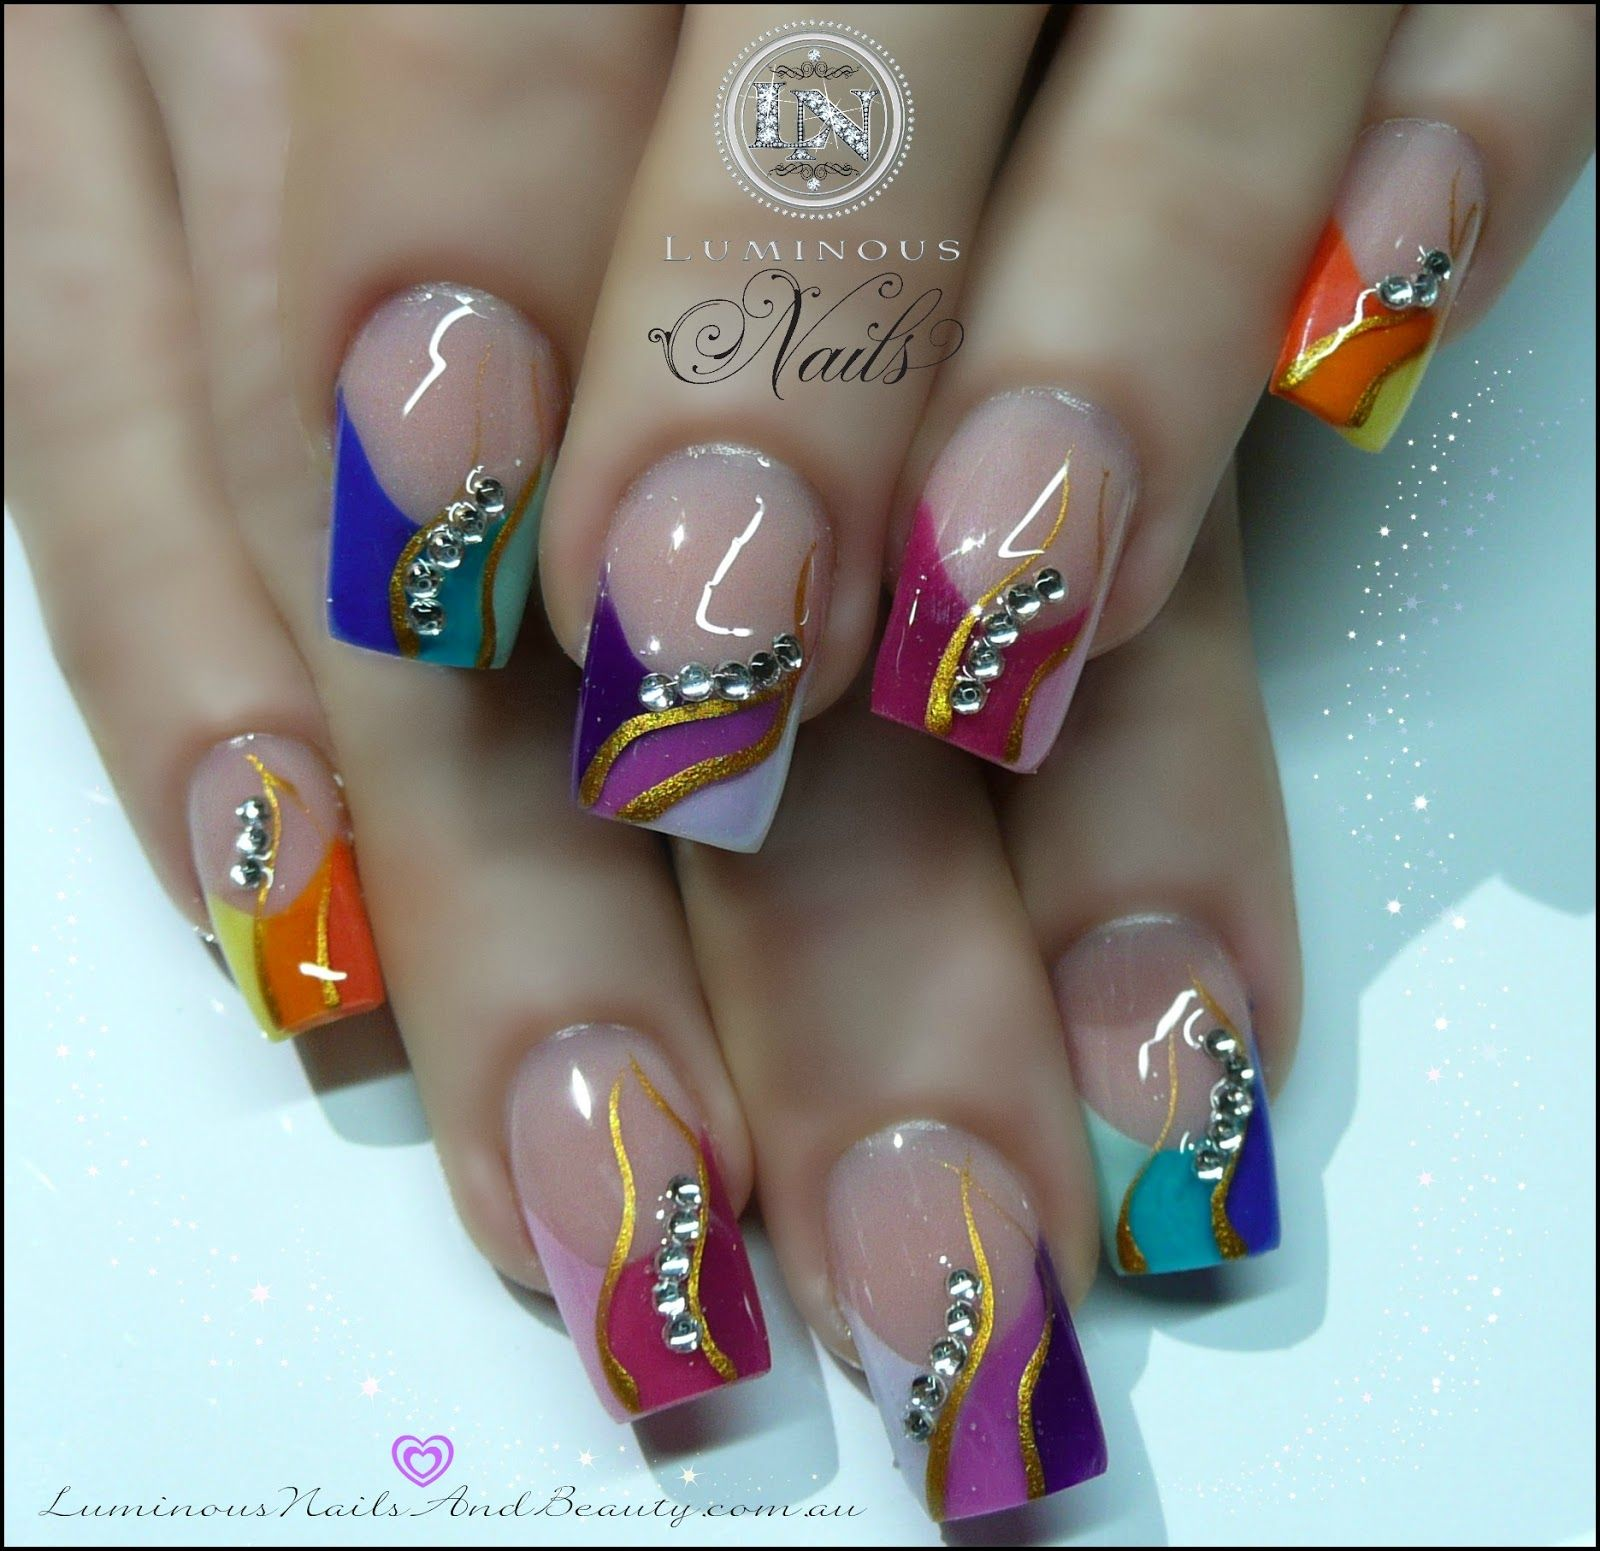 luminous nail and beauty   Luminous+Nails+and+Beauty,+Gold+Coast+ ...